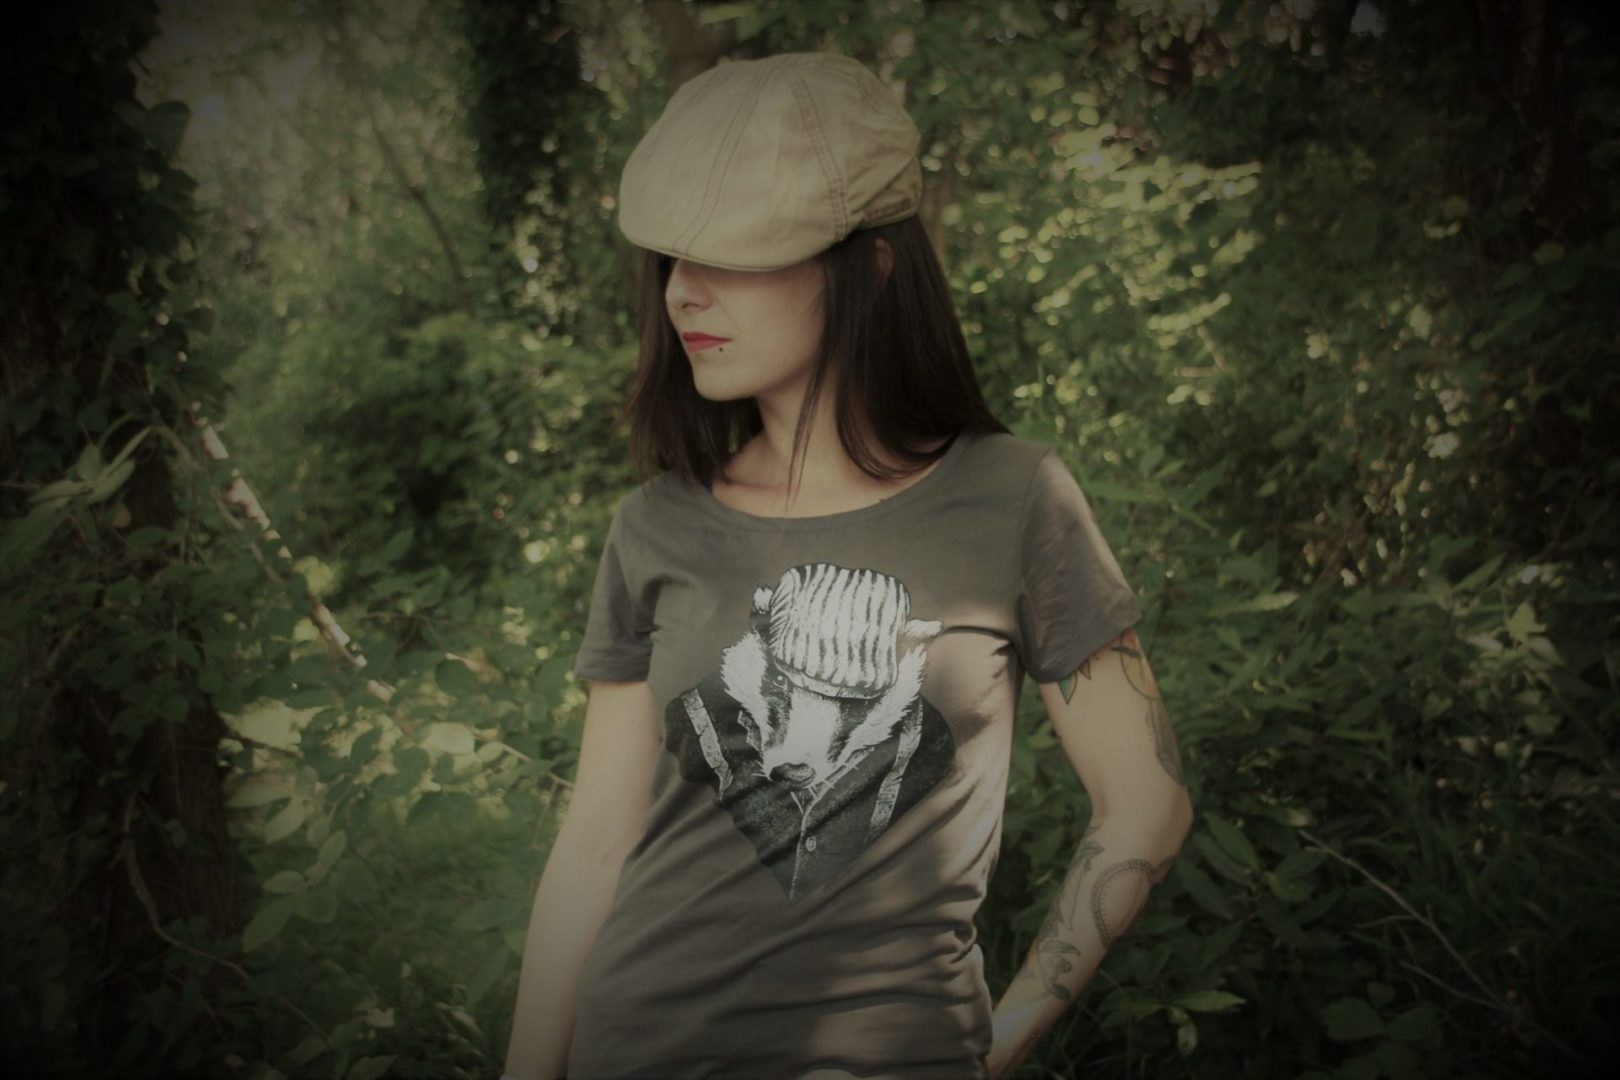 stamp-t-shirt